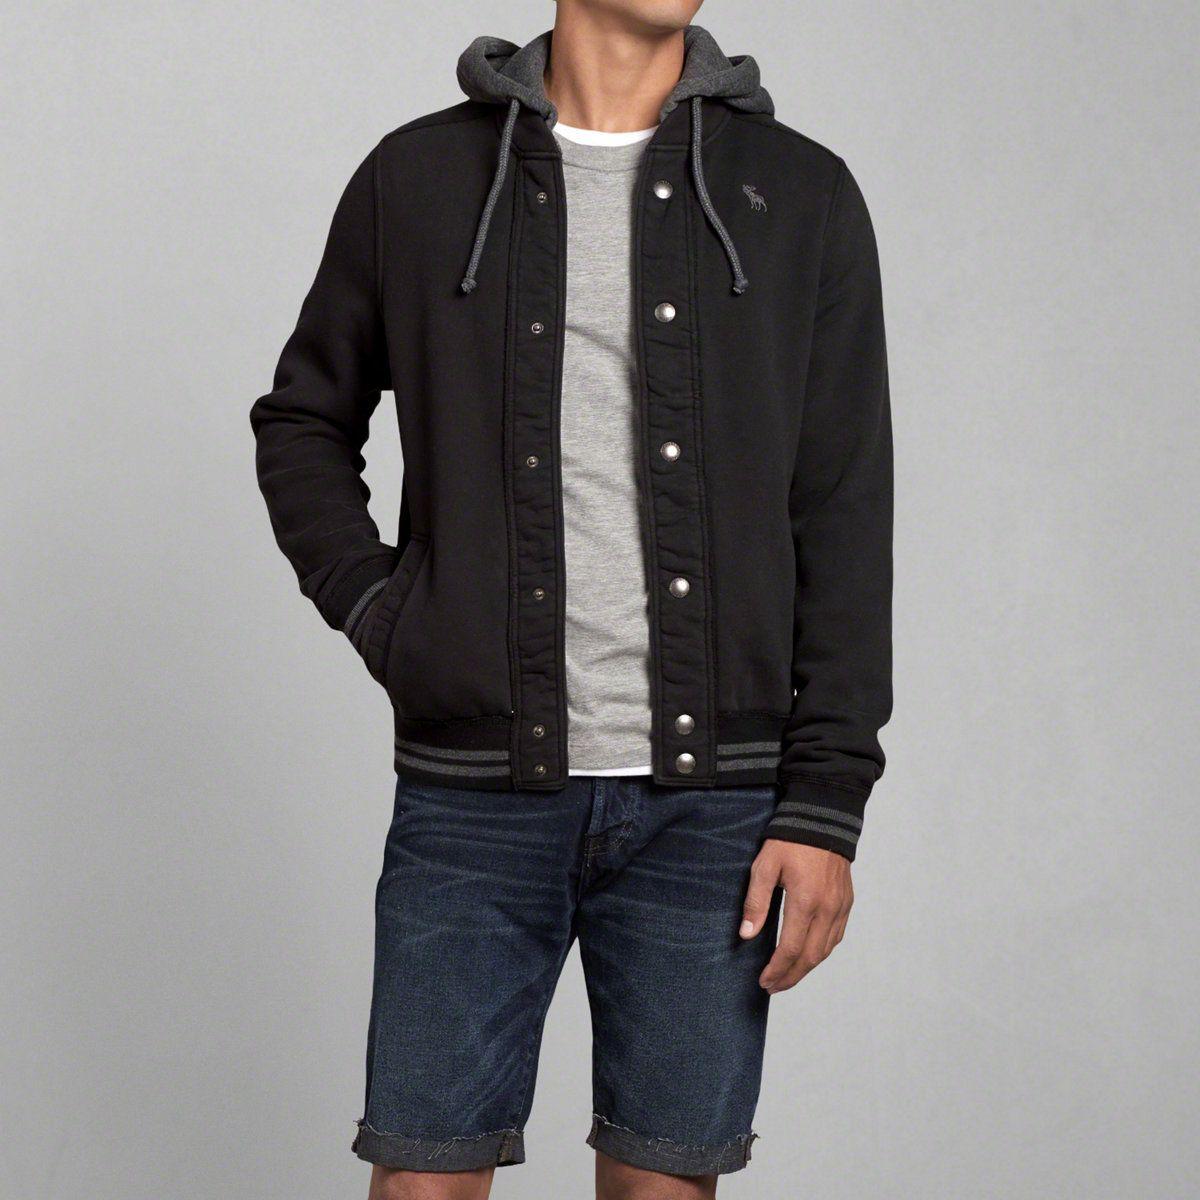 Mens Iconic Hooded Baseball Jacket | Mens Hoodies & Sweatshirts ...